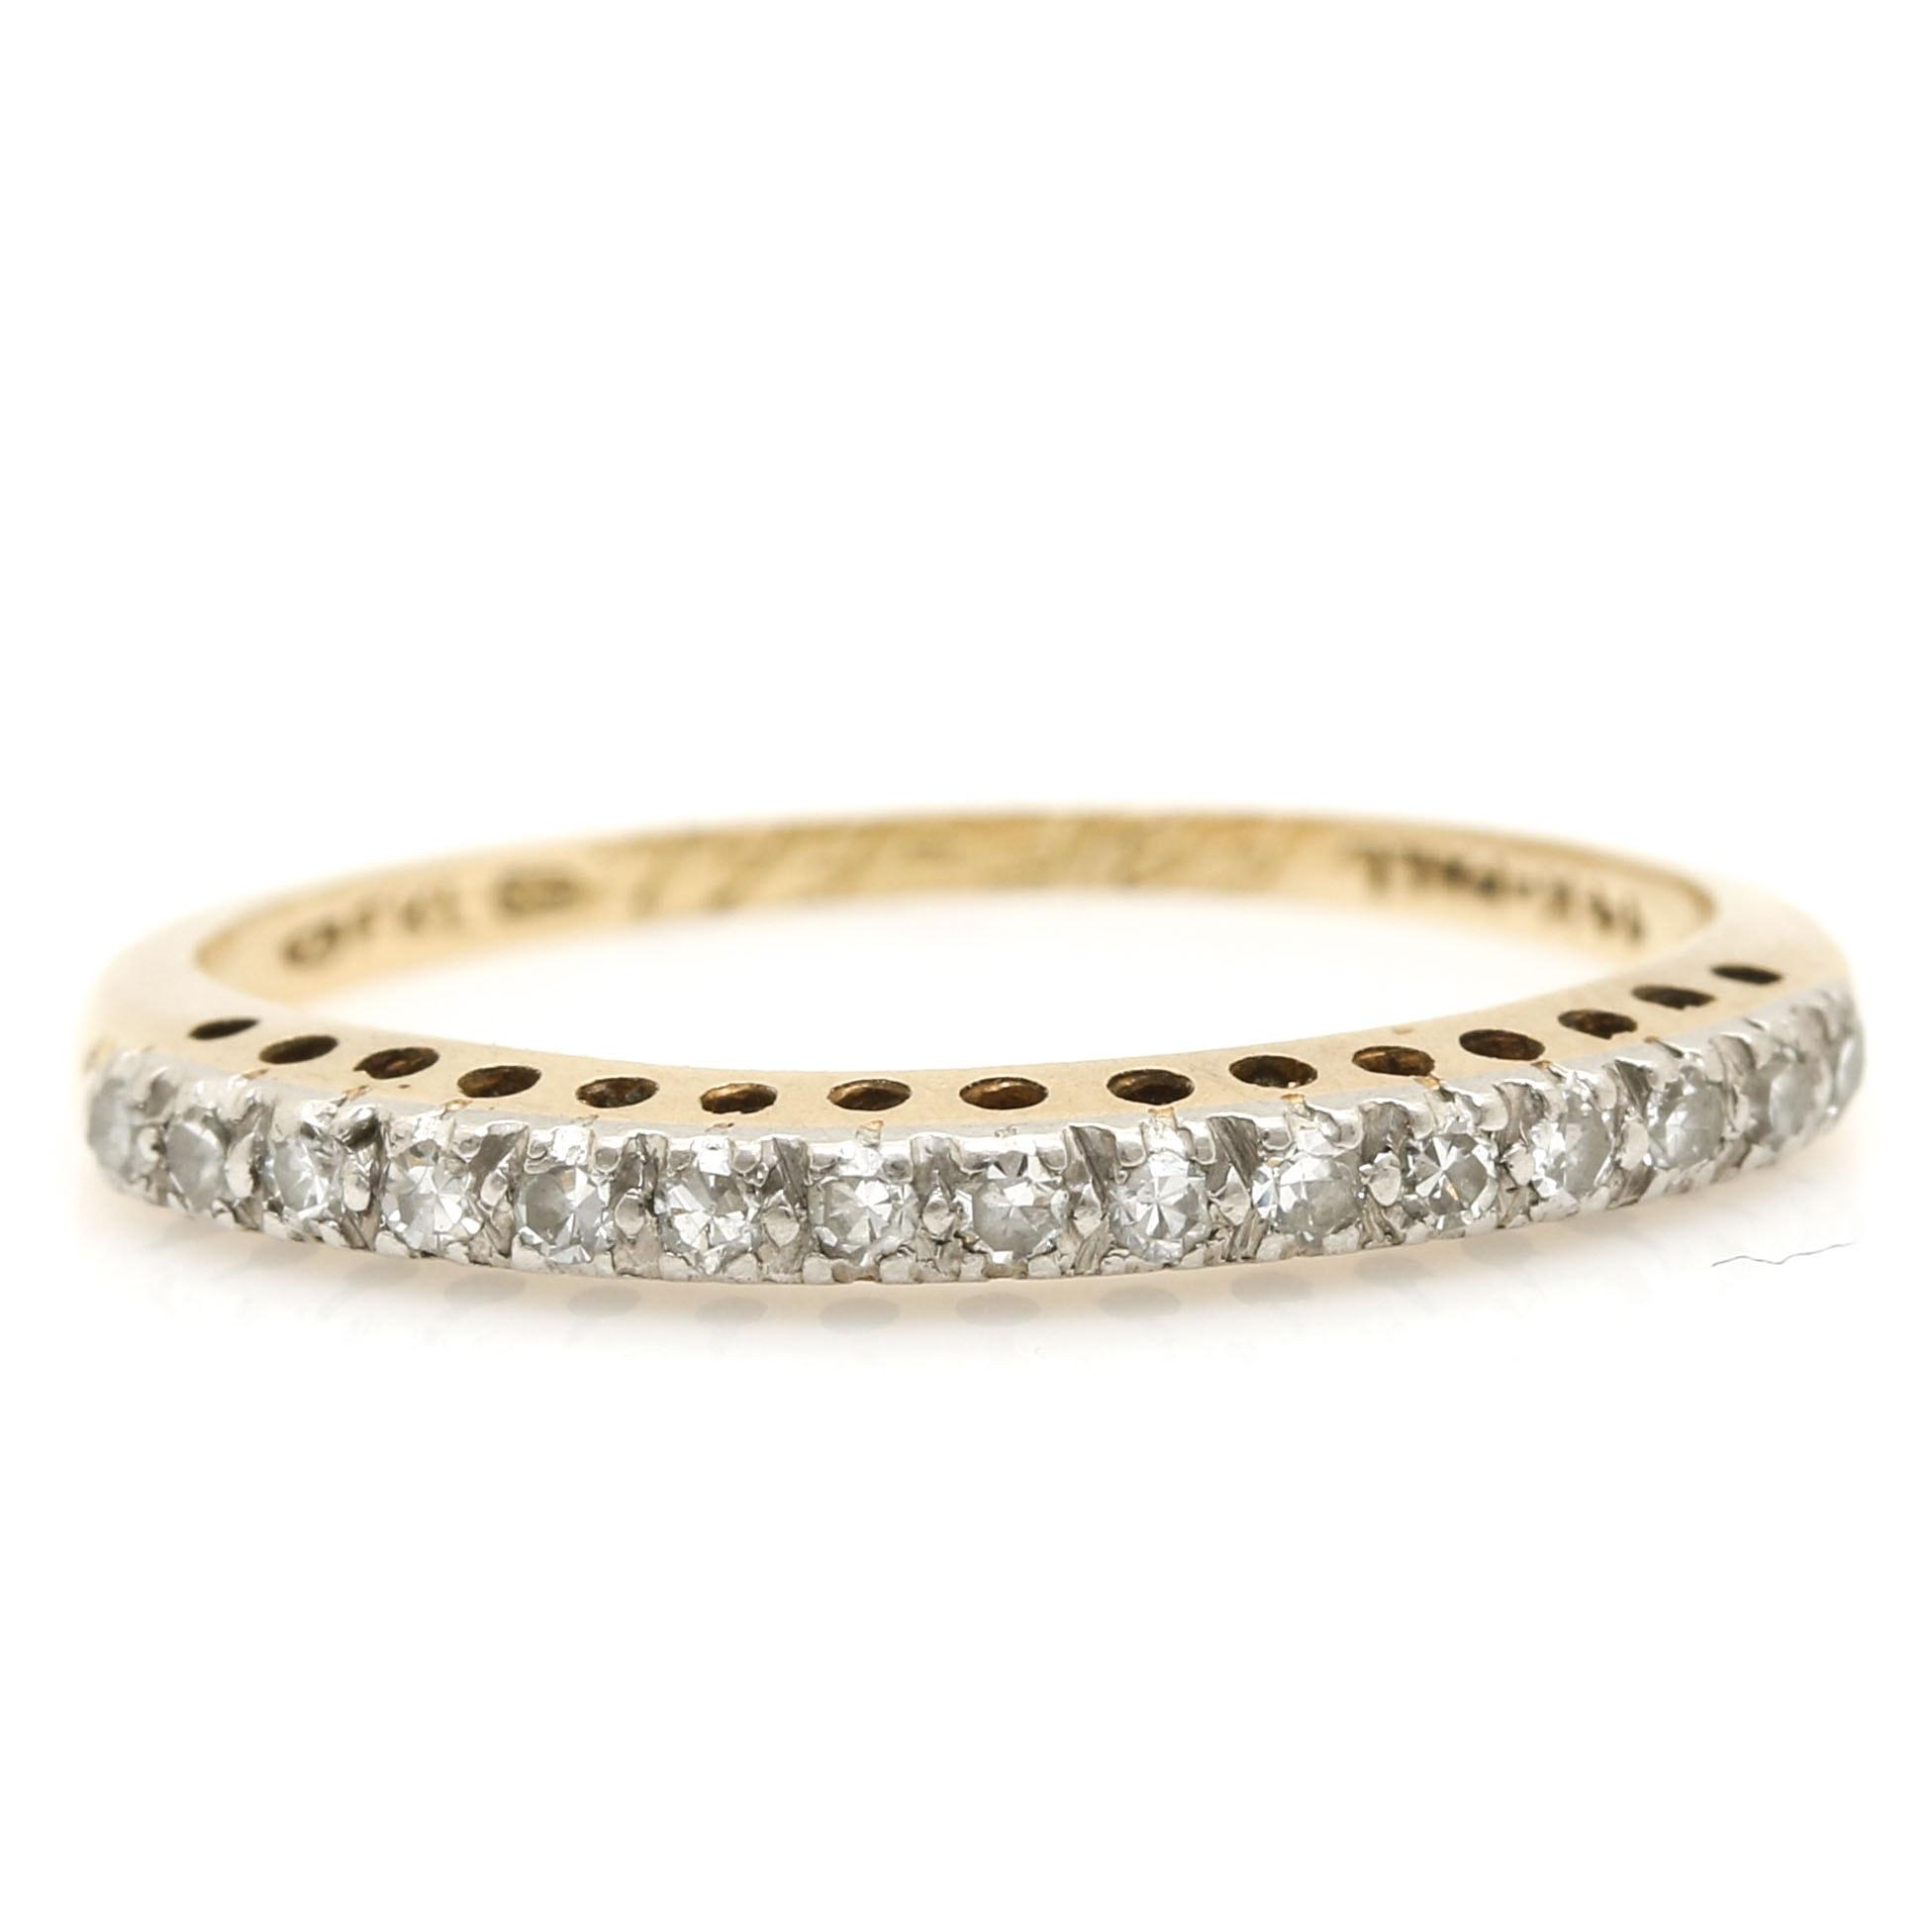 14K Yellow Gold and Palladium Diamond Ring